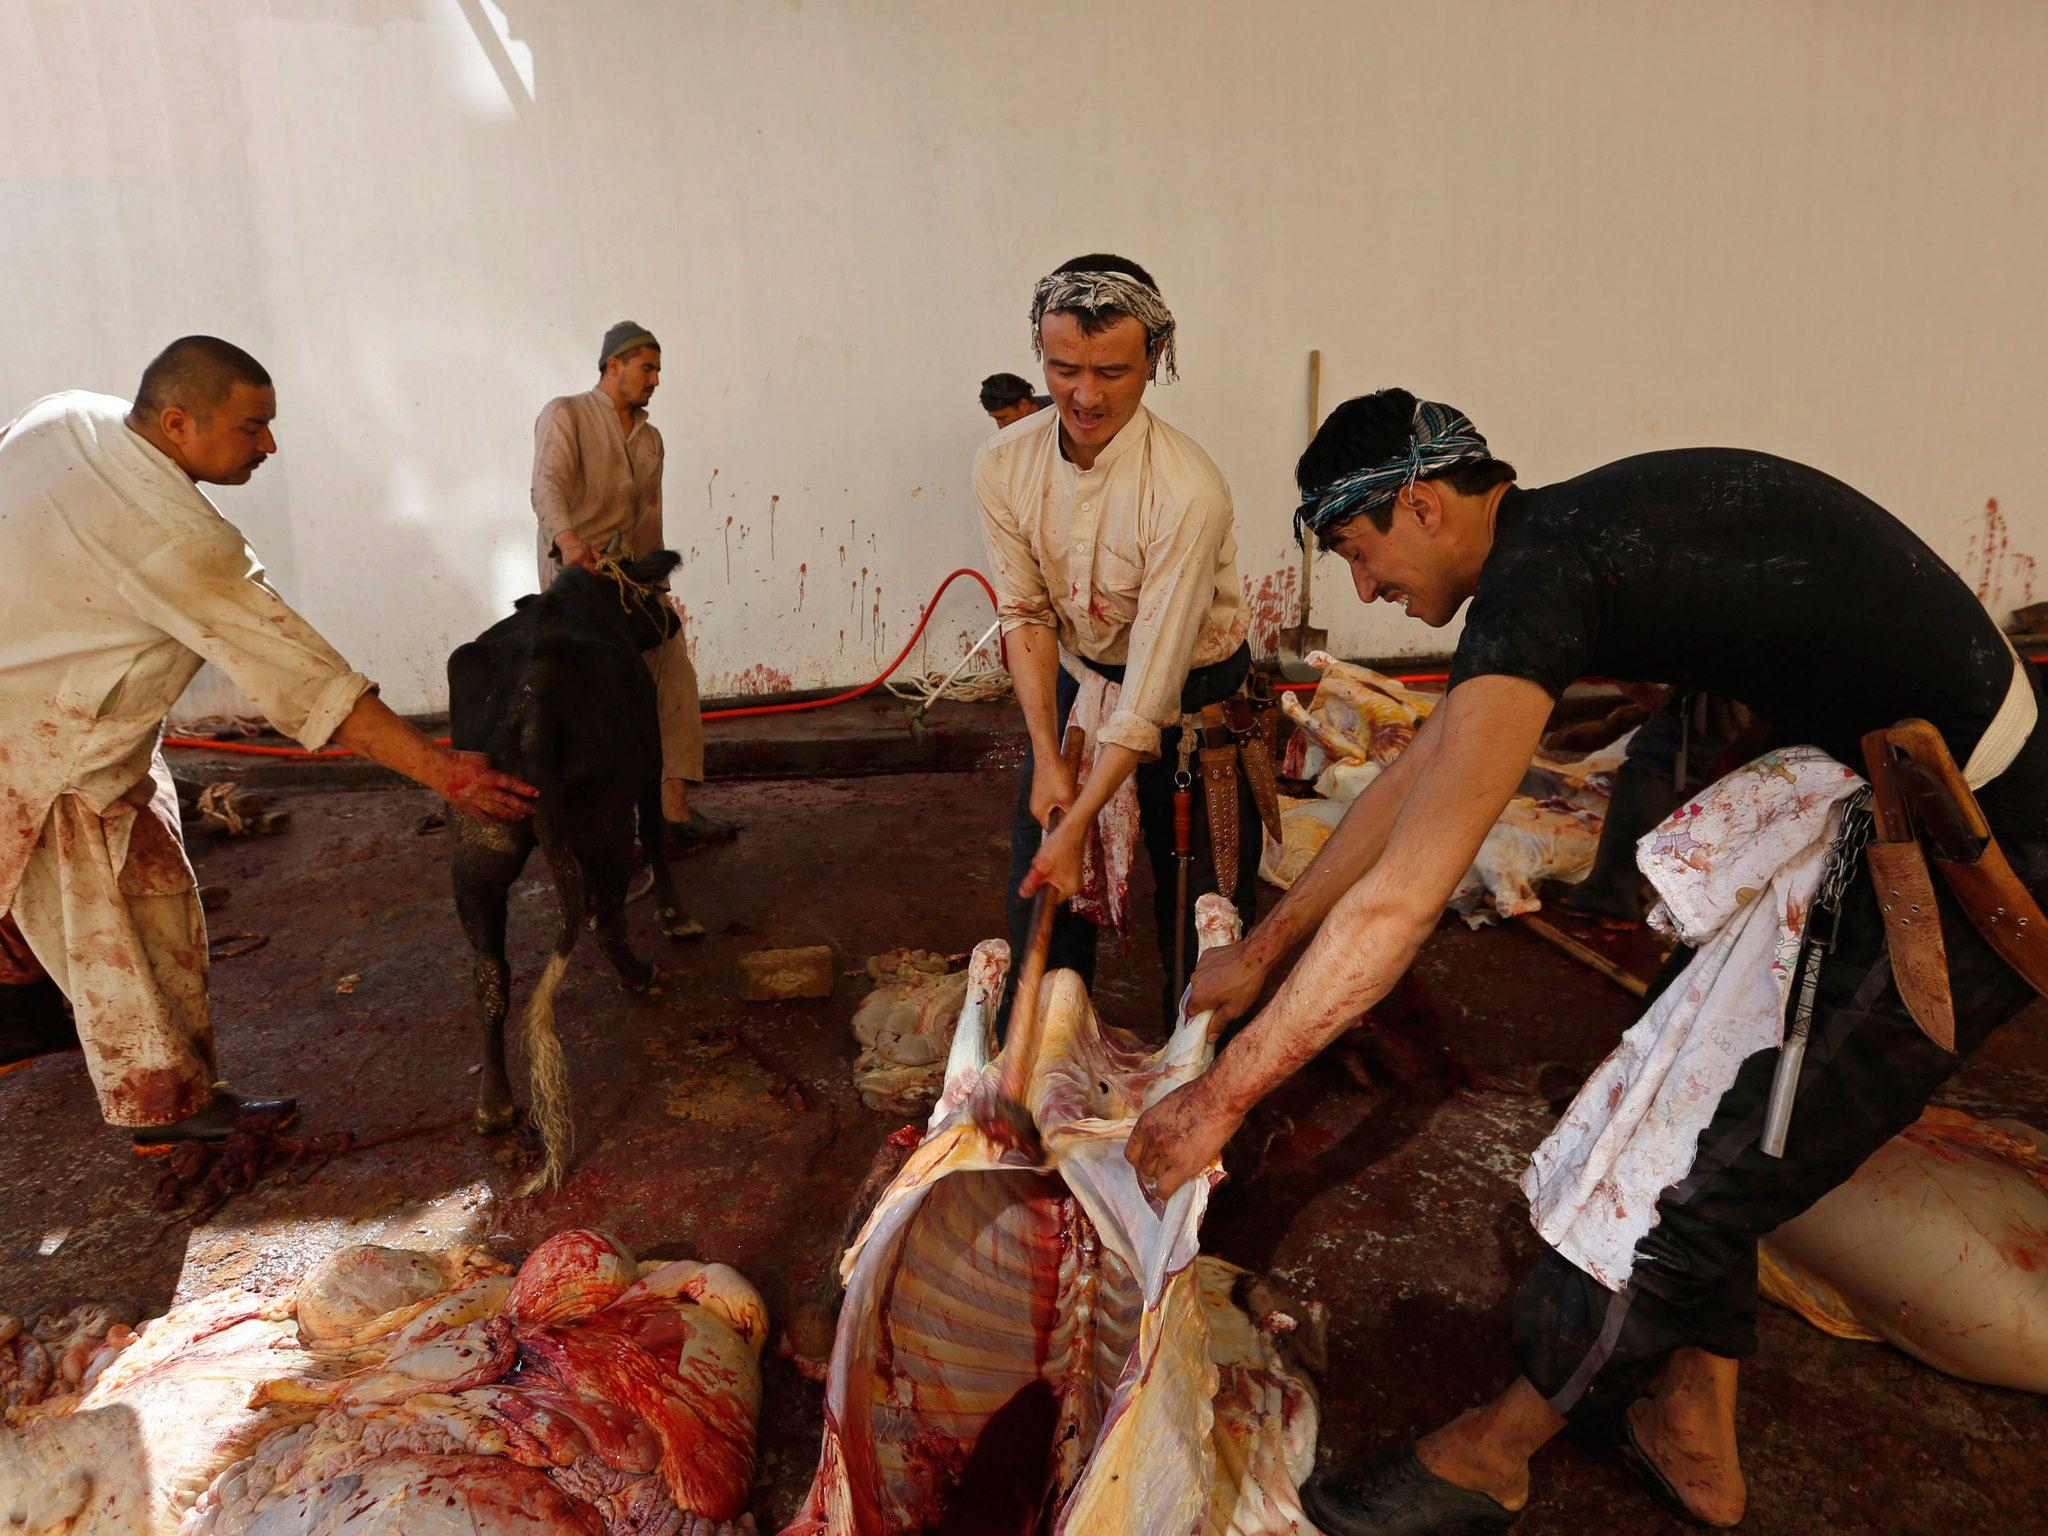 Eid Mubarak 2014 What Is Eid Al Adha And Why Is Sacrifice